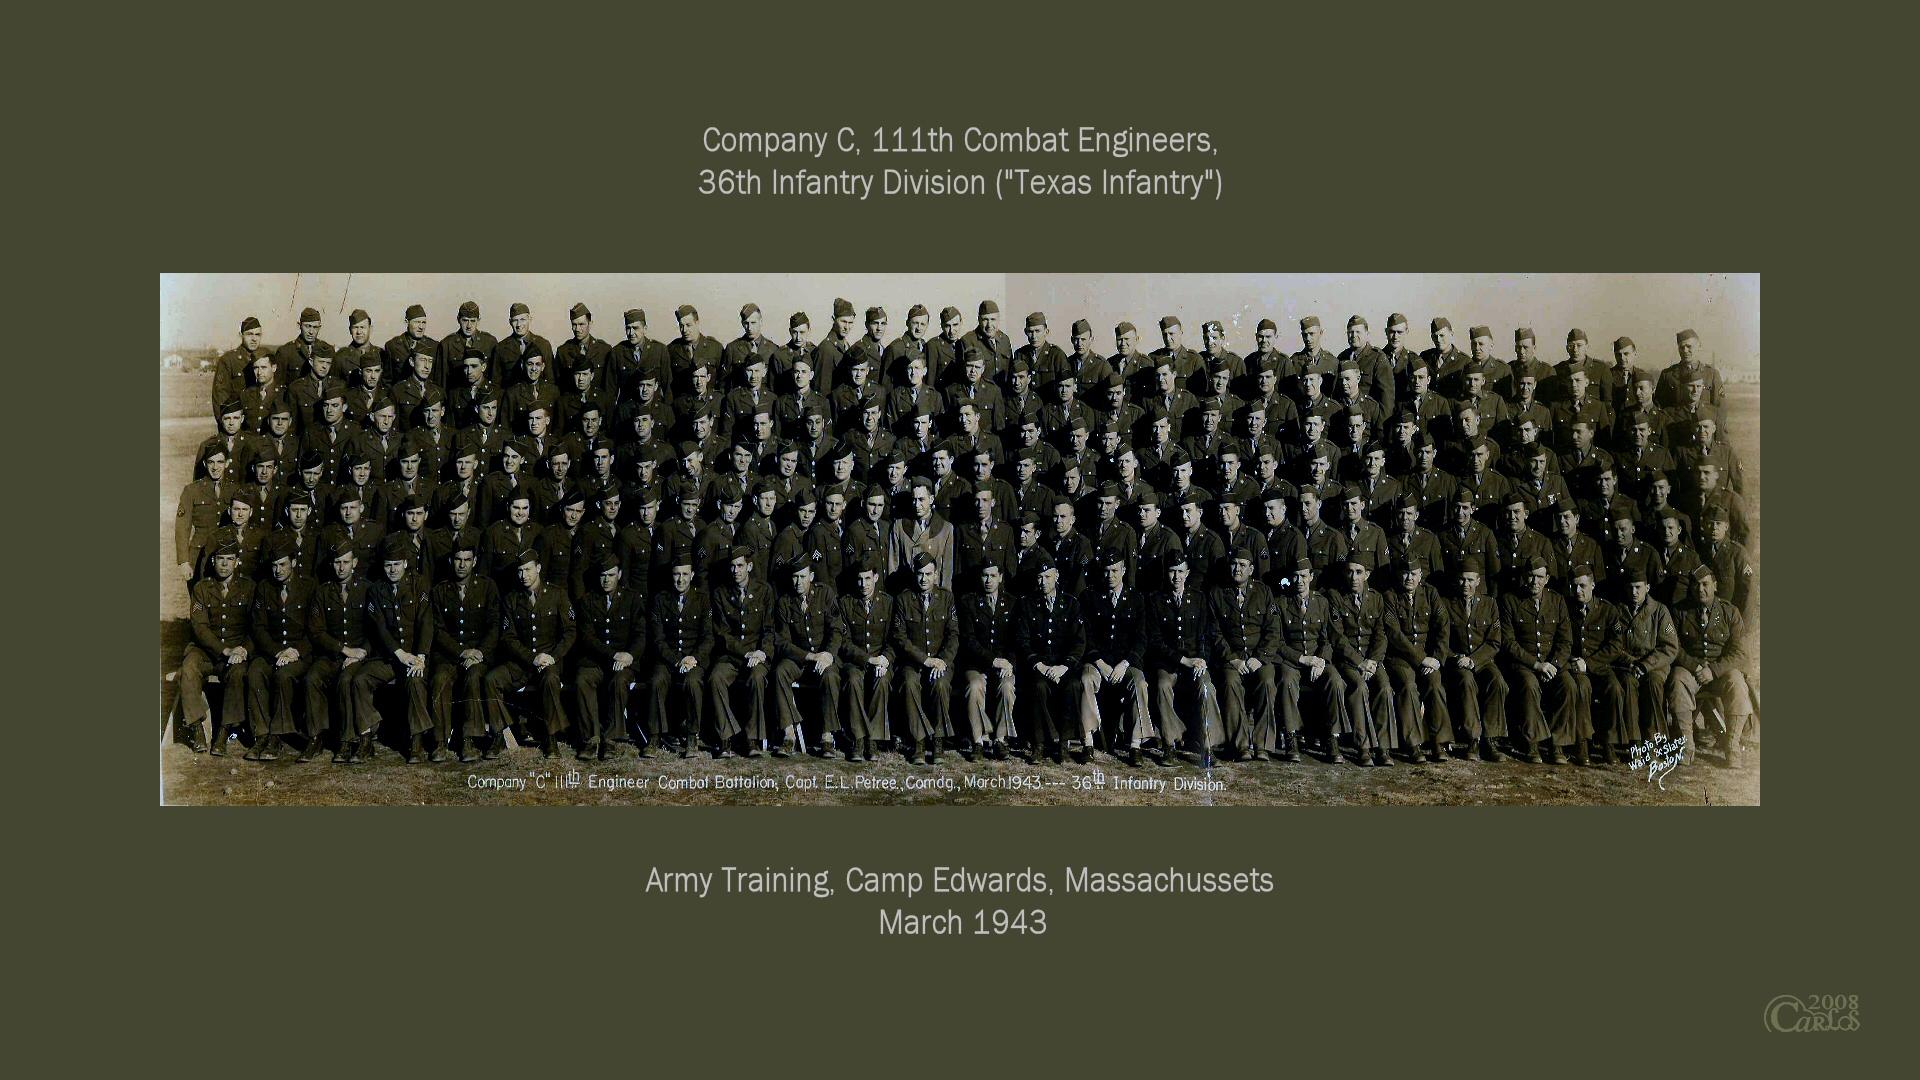 Cw 111th Engineers Group